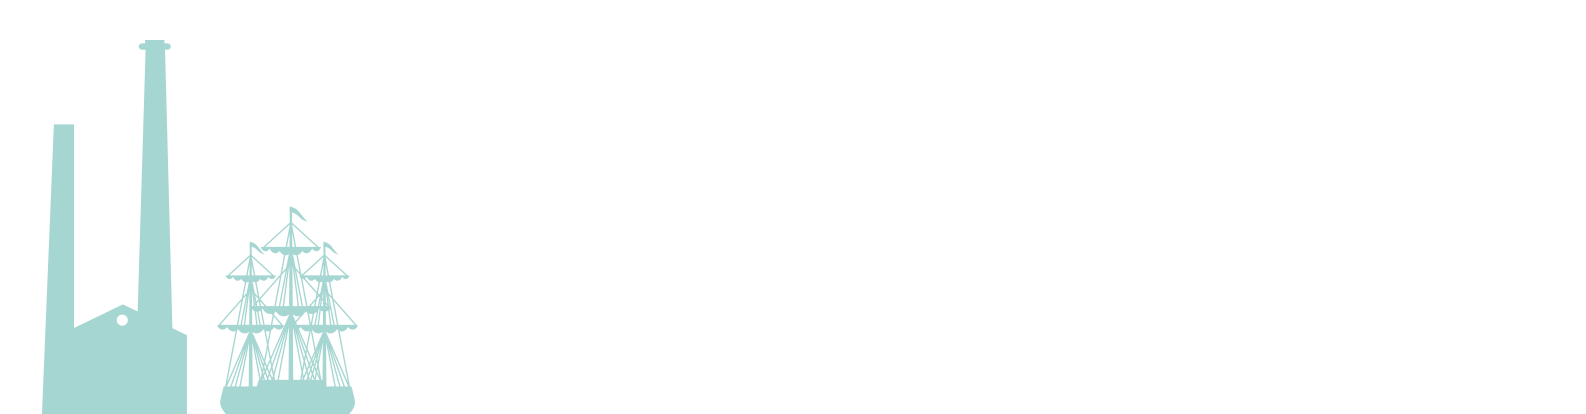 Hafod Morfa Copperworks